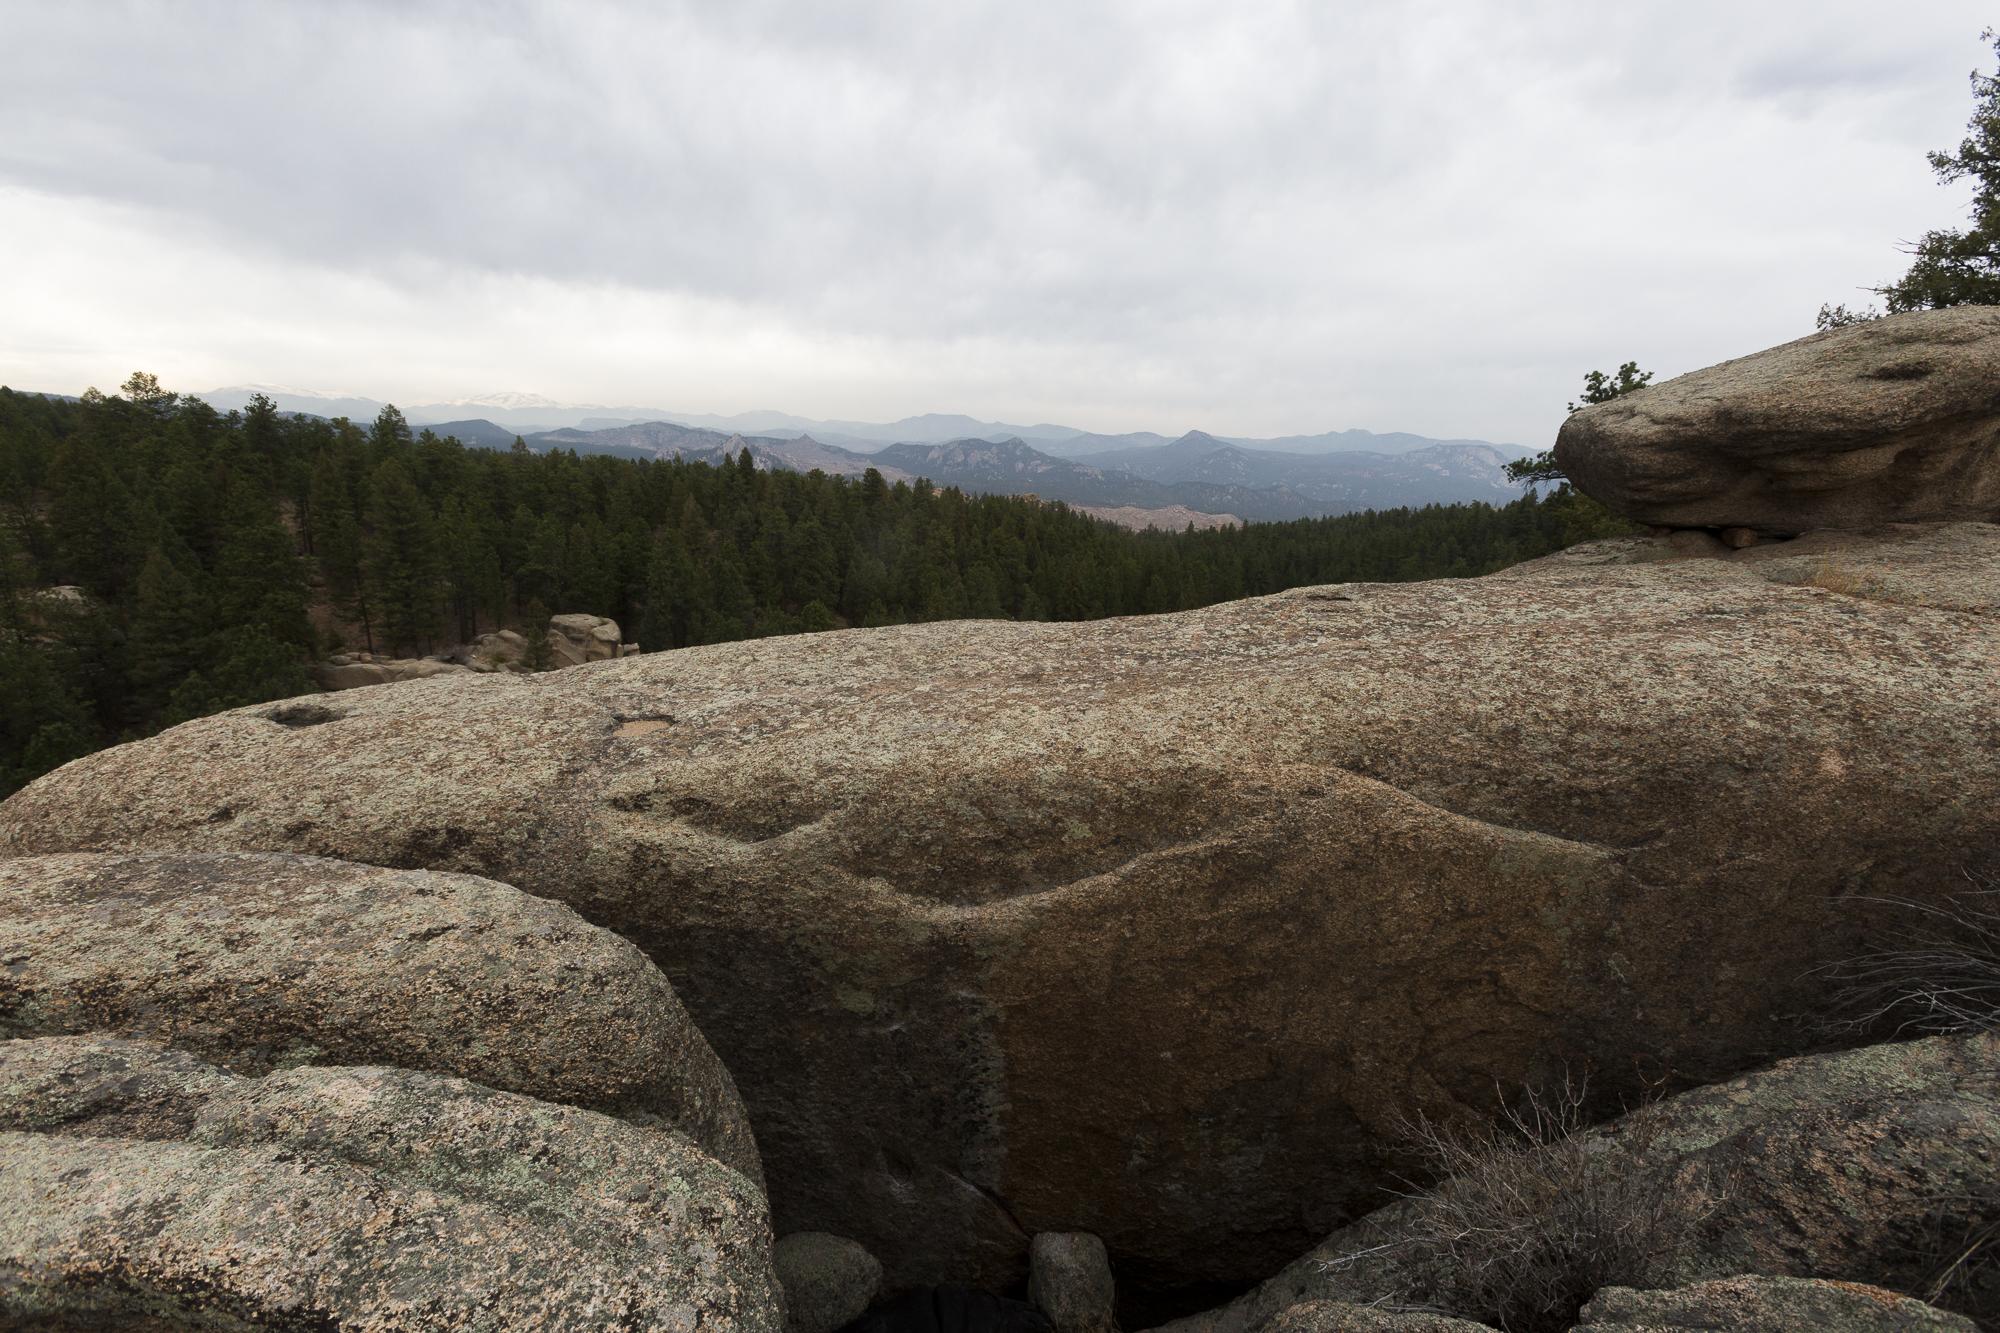 Pike_National_Forest_Bouldering_CO-4804.jpg